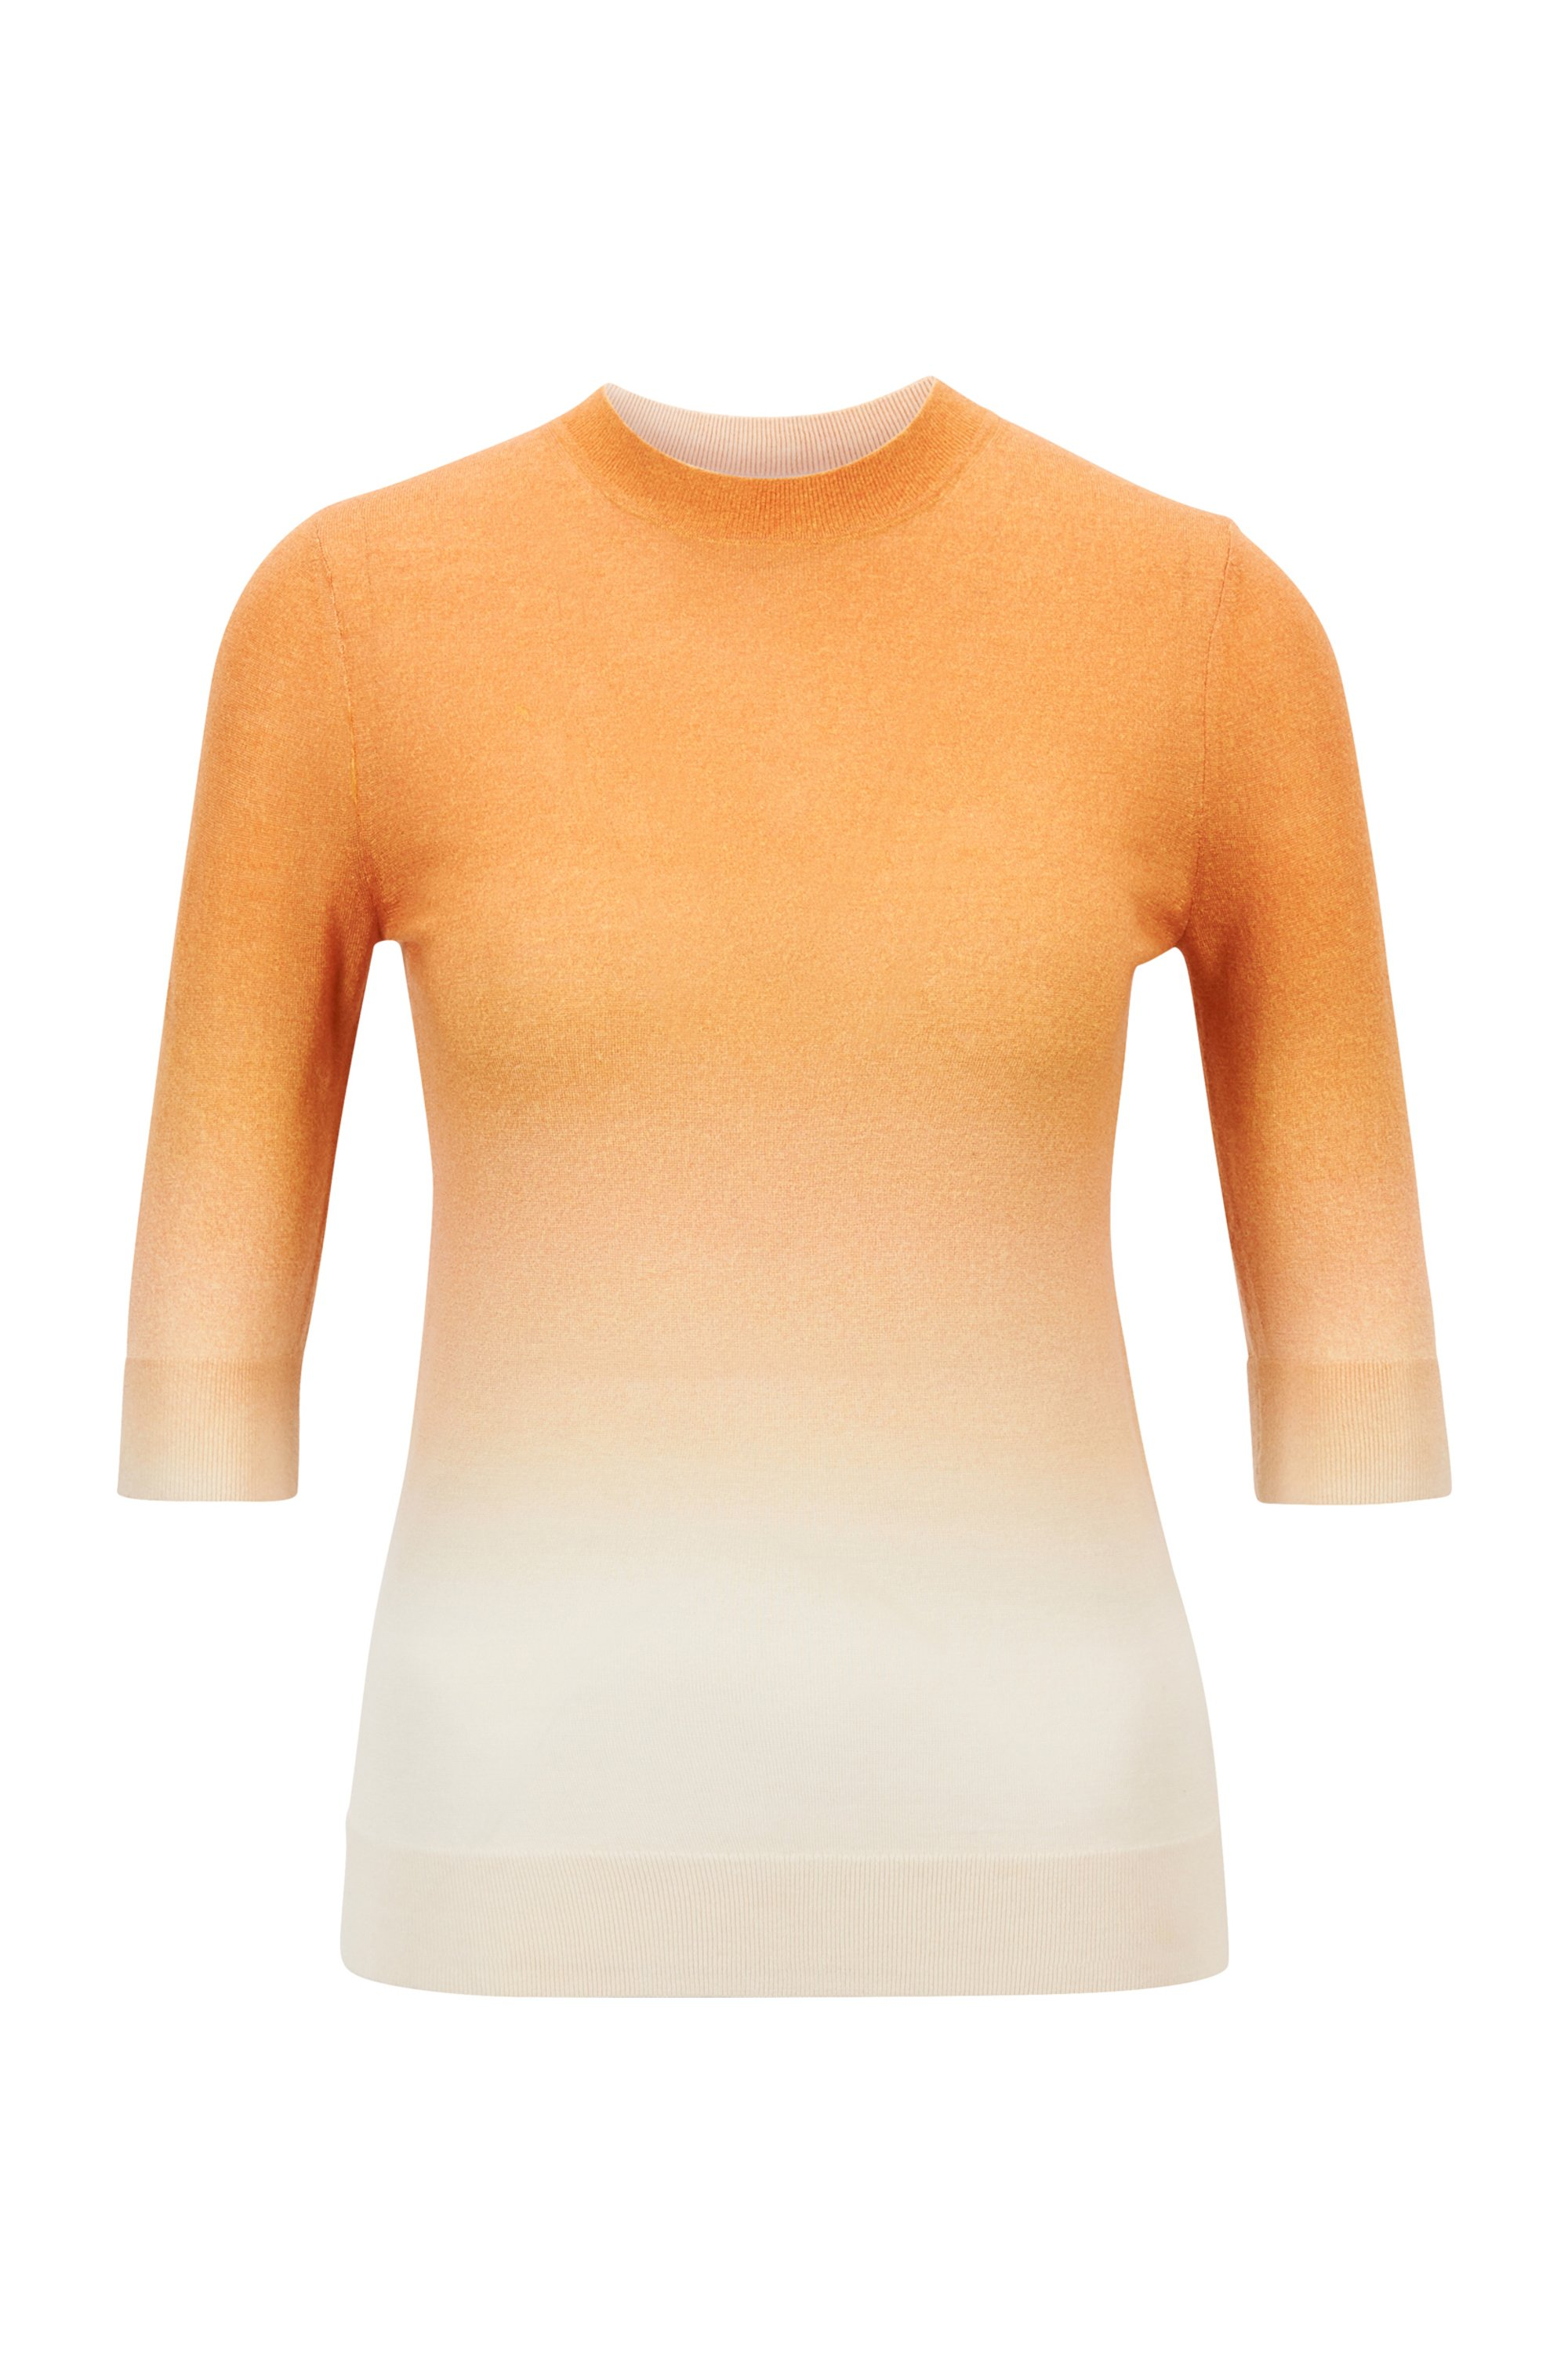 Virgin-wool sweater with ombré print, Orange Patterned